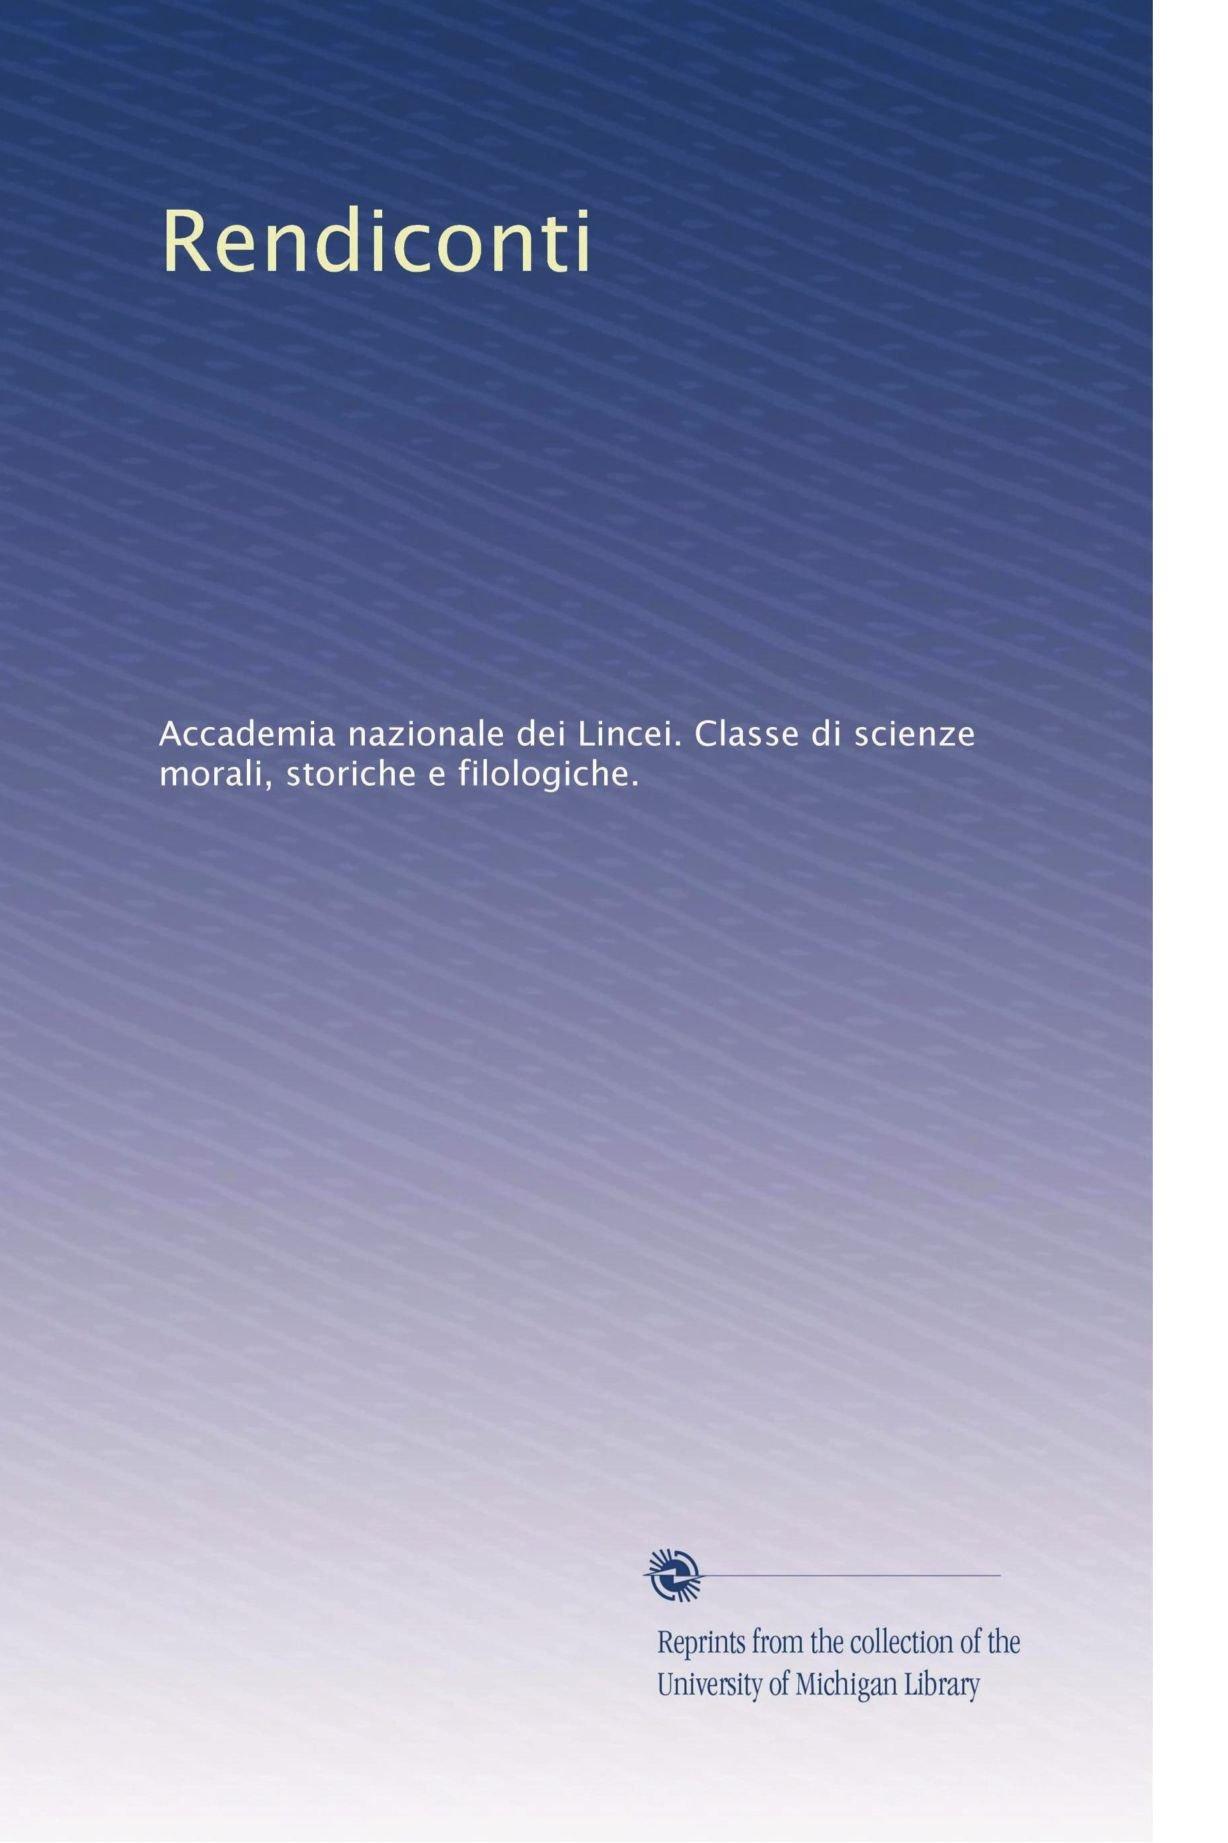 Rendiconti (Italian Edition) ebook